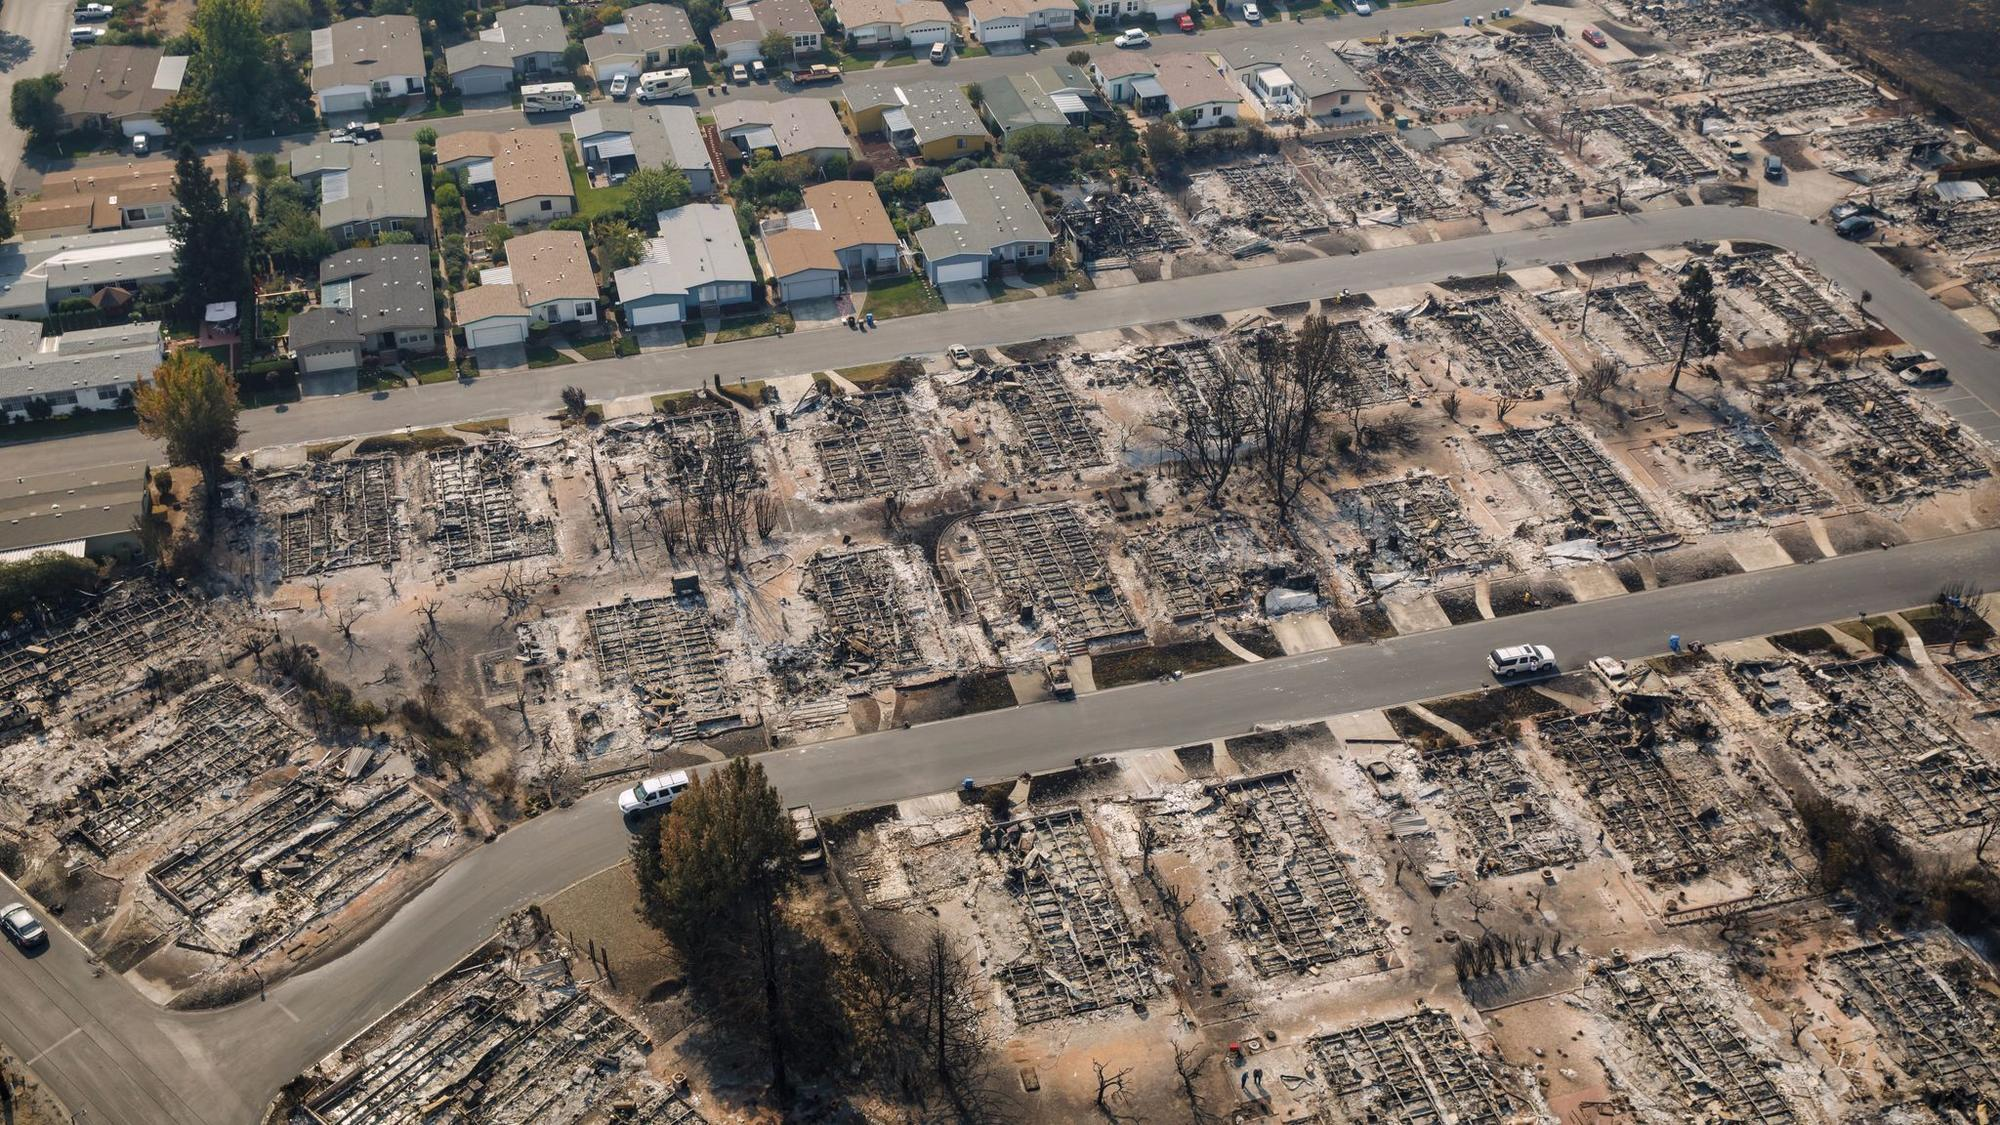 despite clear risks santa rosa neighborhood that burned